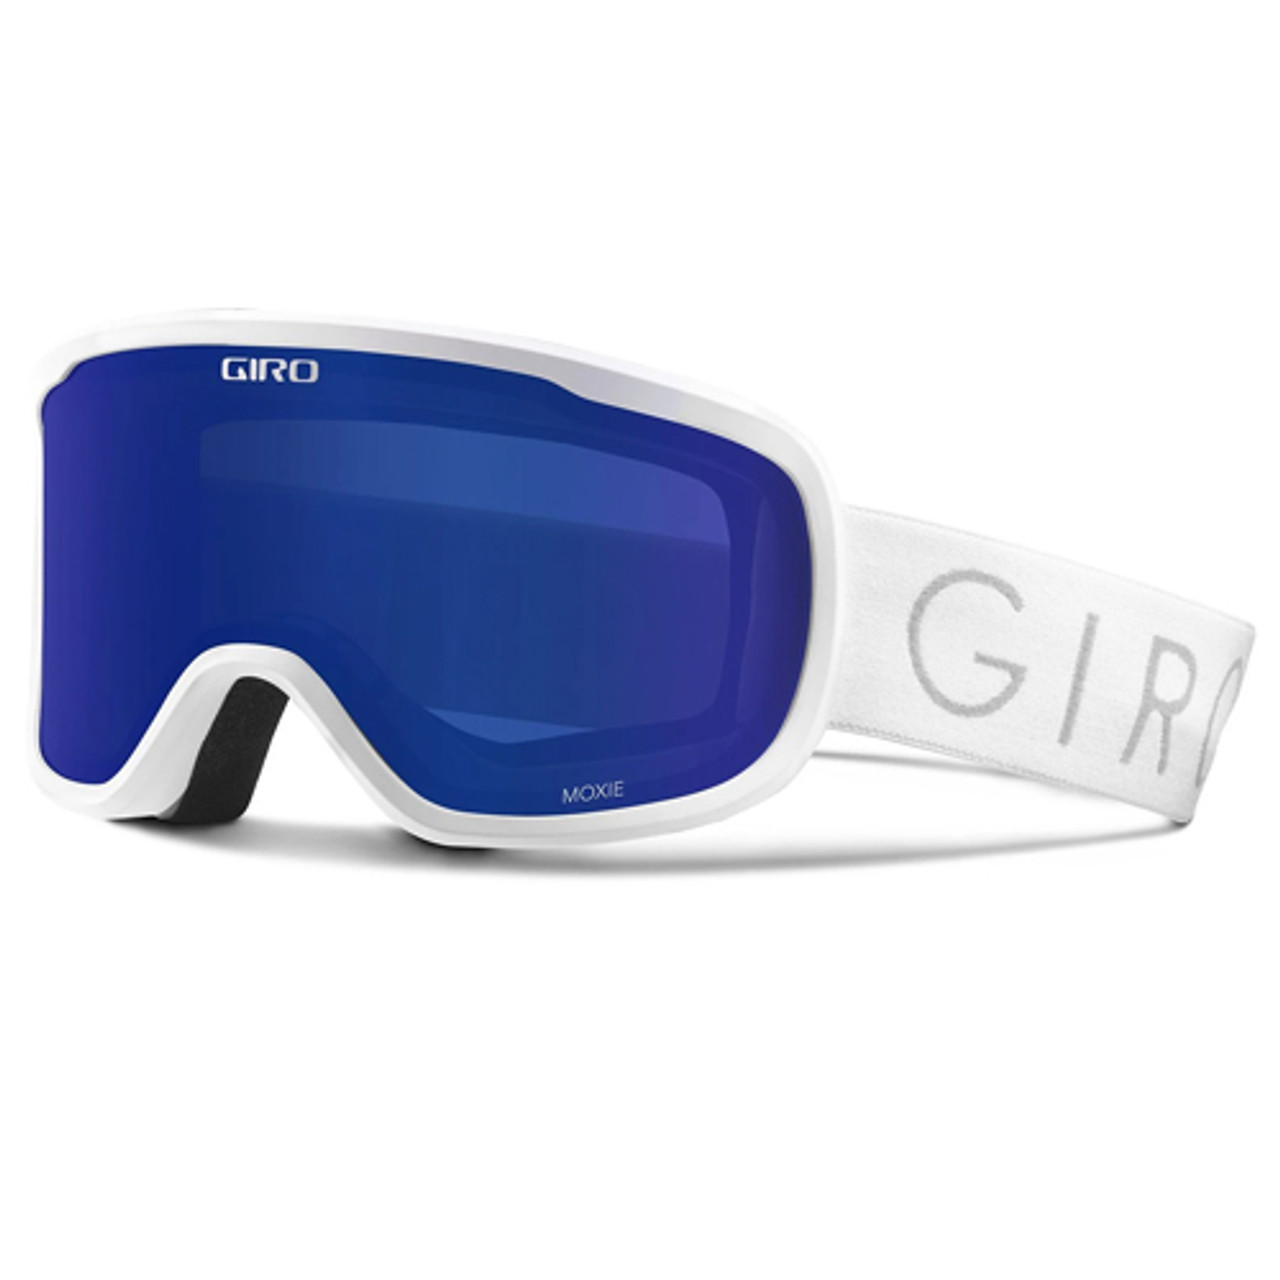 Lens for the Giro Cruz Roam Moxie Ski Goggles